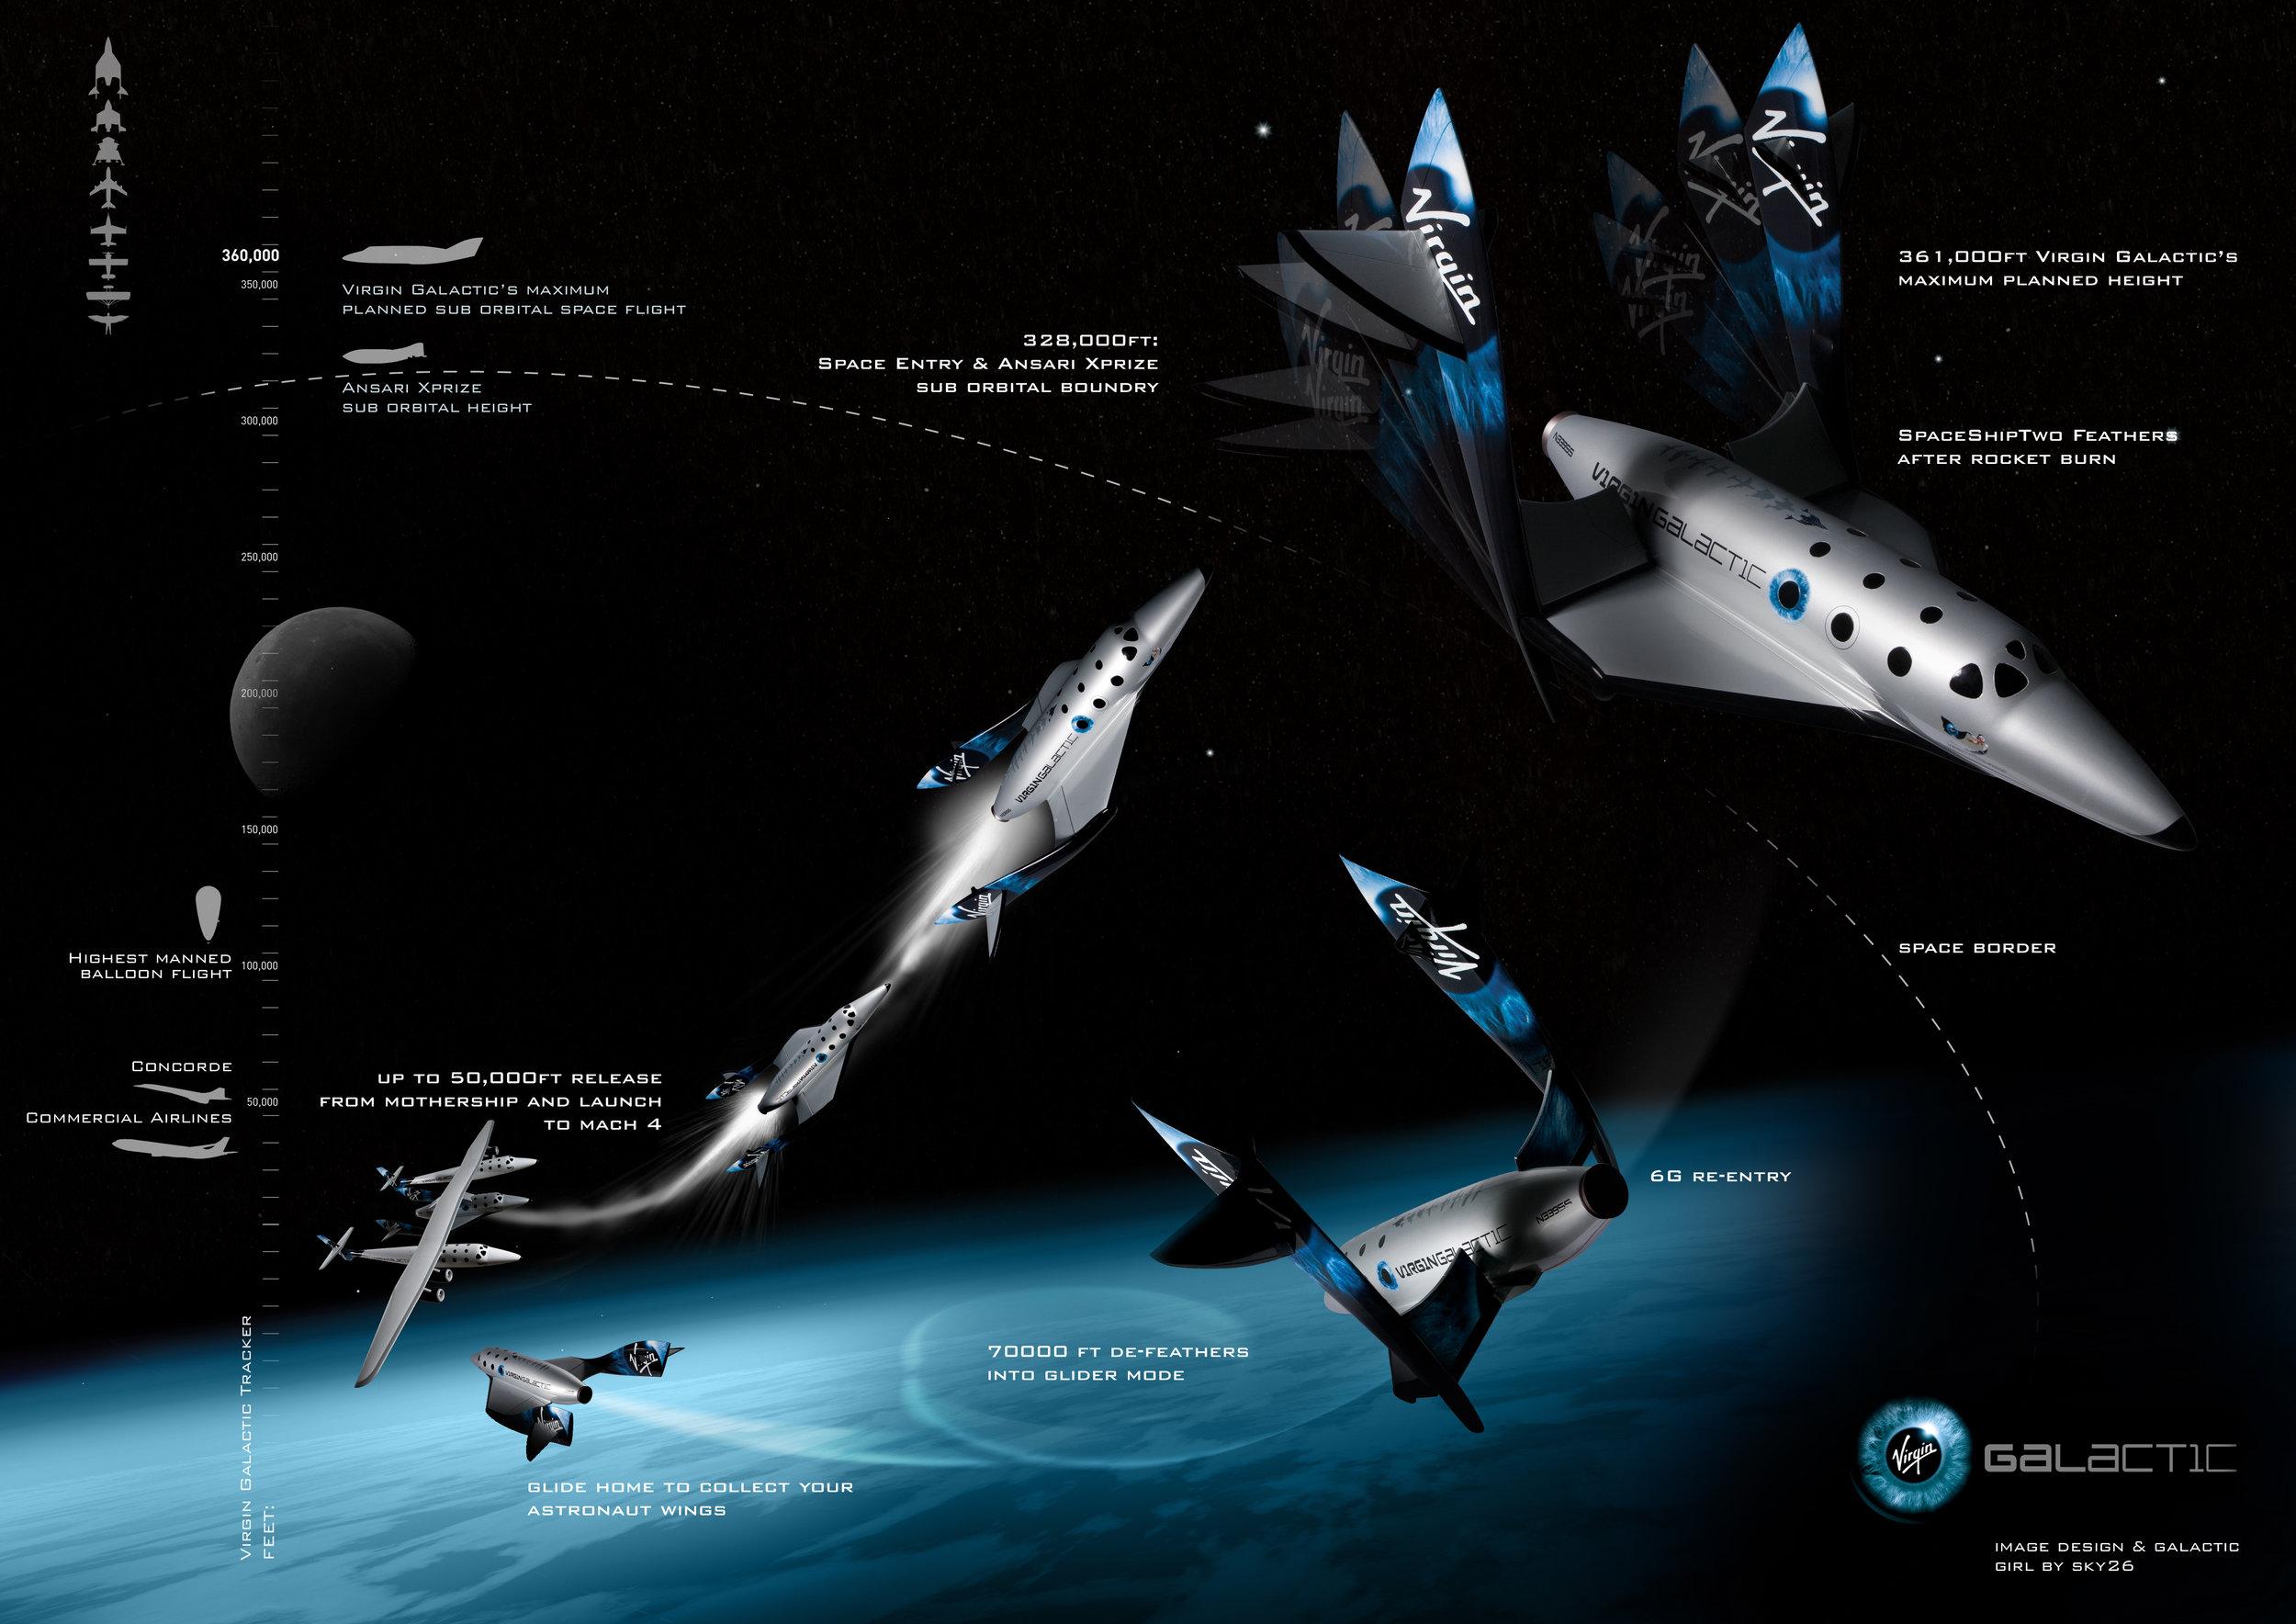 Virgin Galactic space flight diagram, Virgin Galactic.